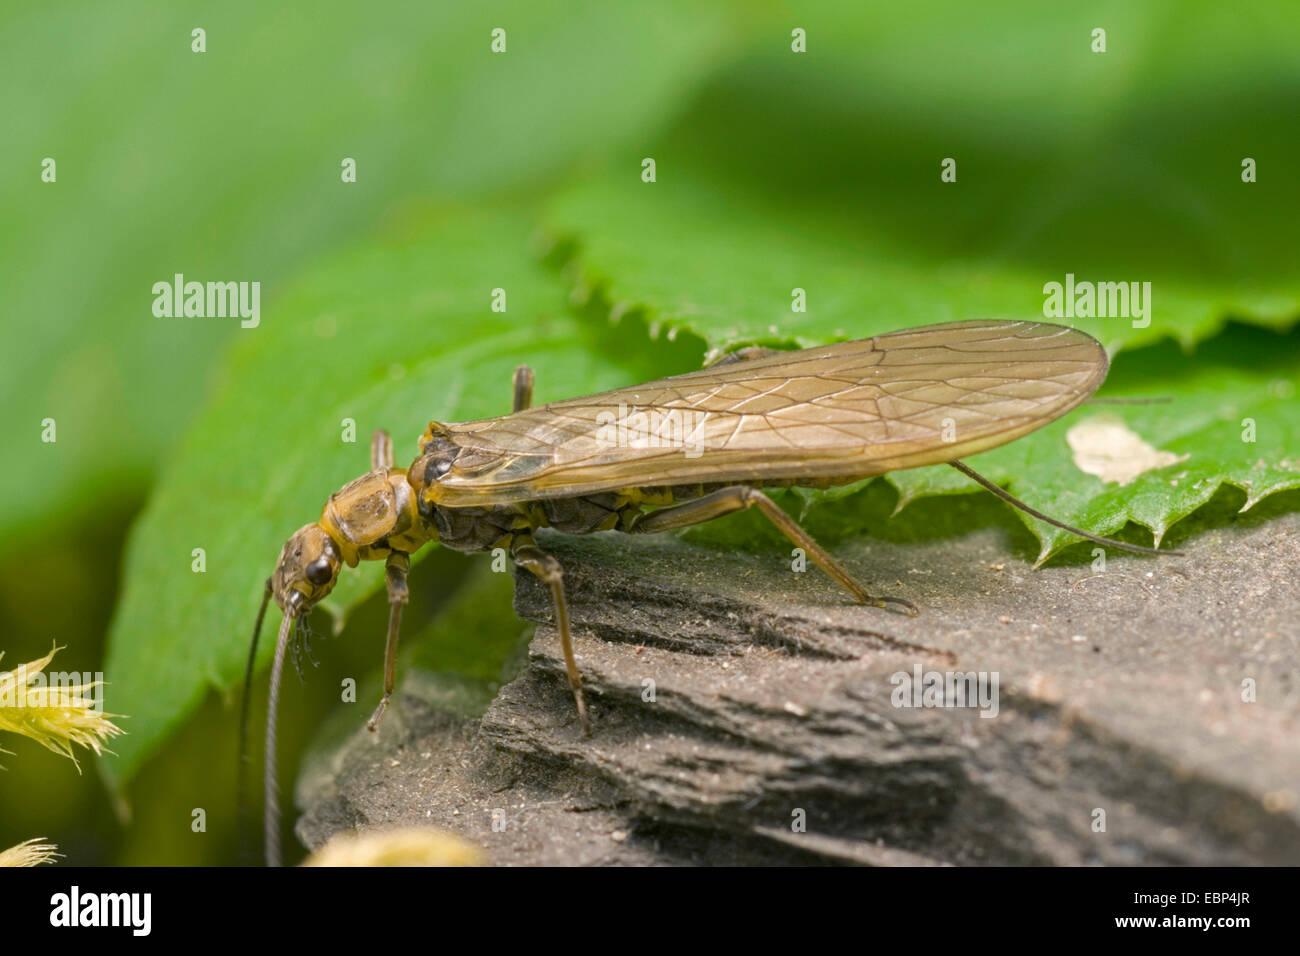 Yellow Sally, Stonefly (Isoperla cf. grammatica,), on a stone, Germany - Stock Image